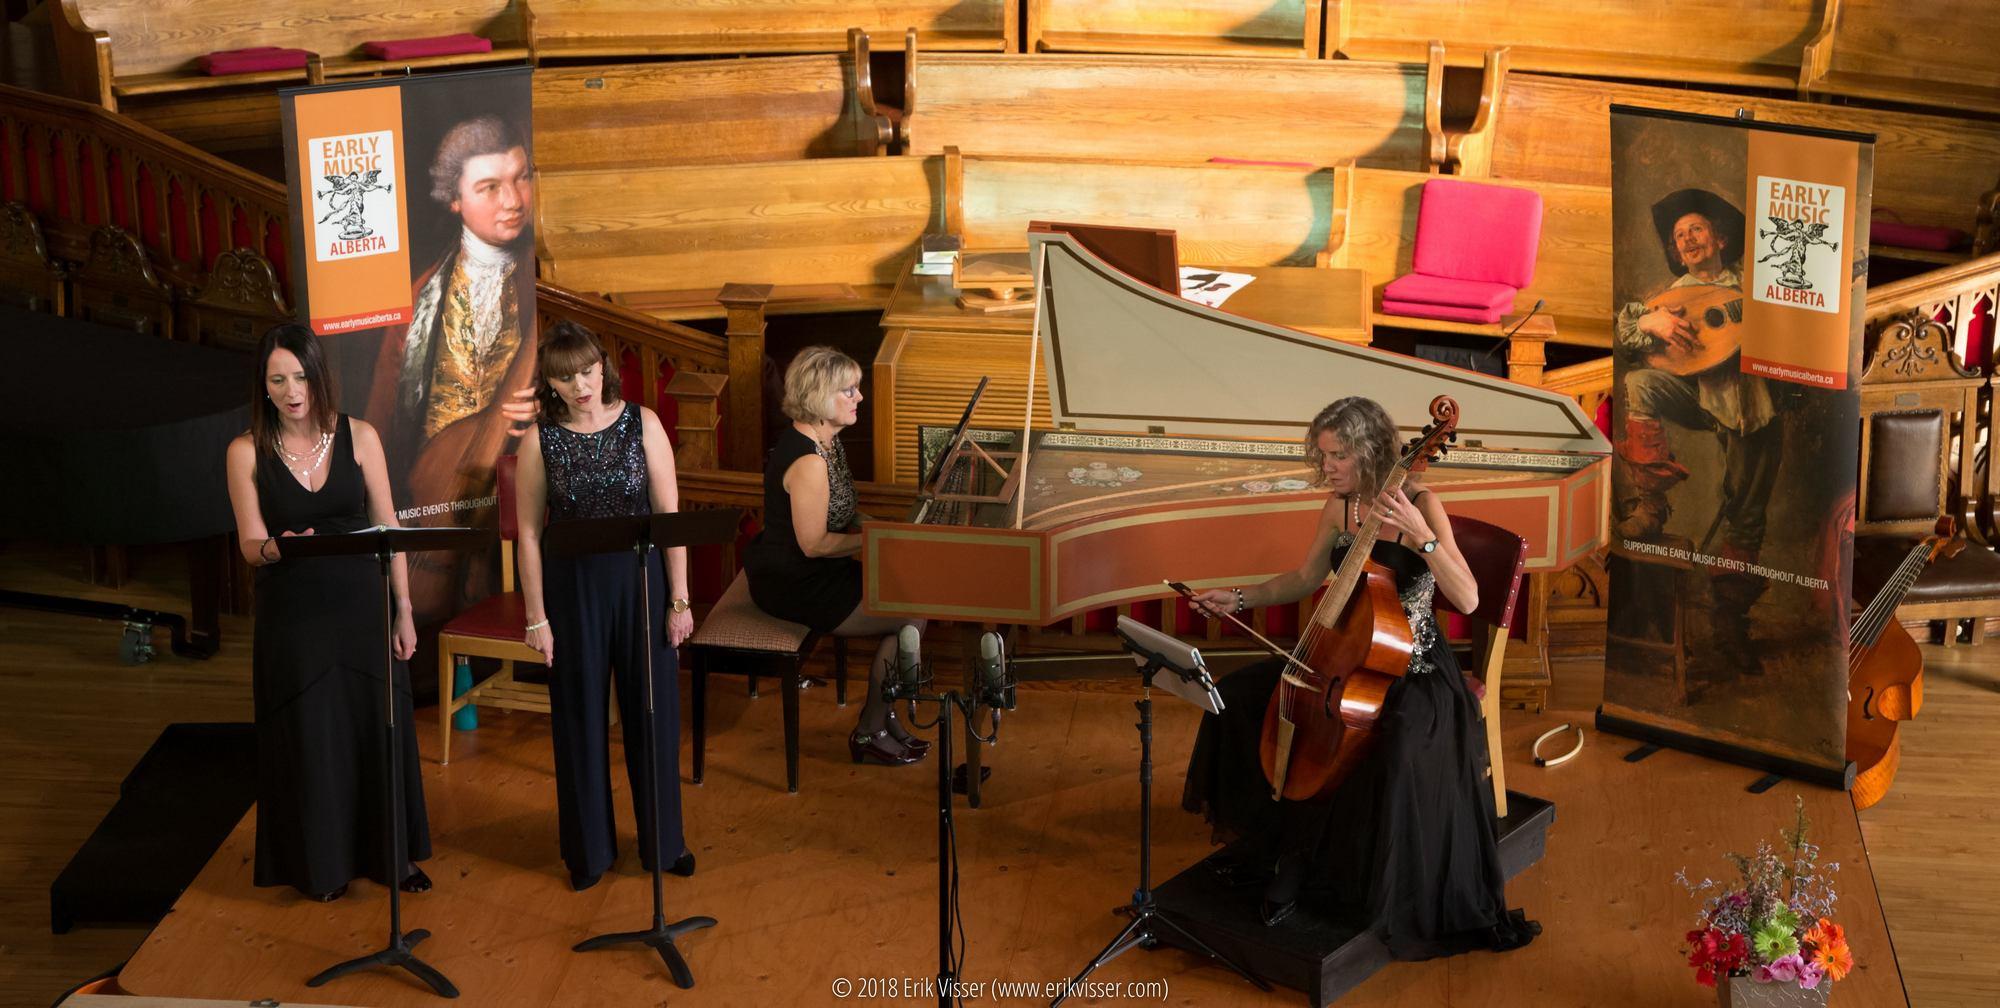 Early Music Alberta Fundraising Concert Jolaine